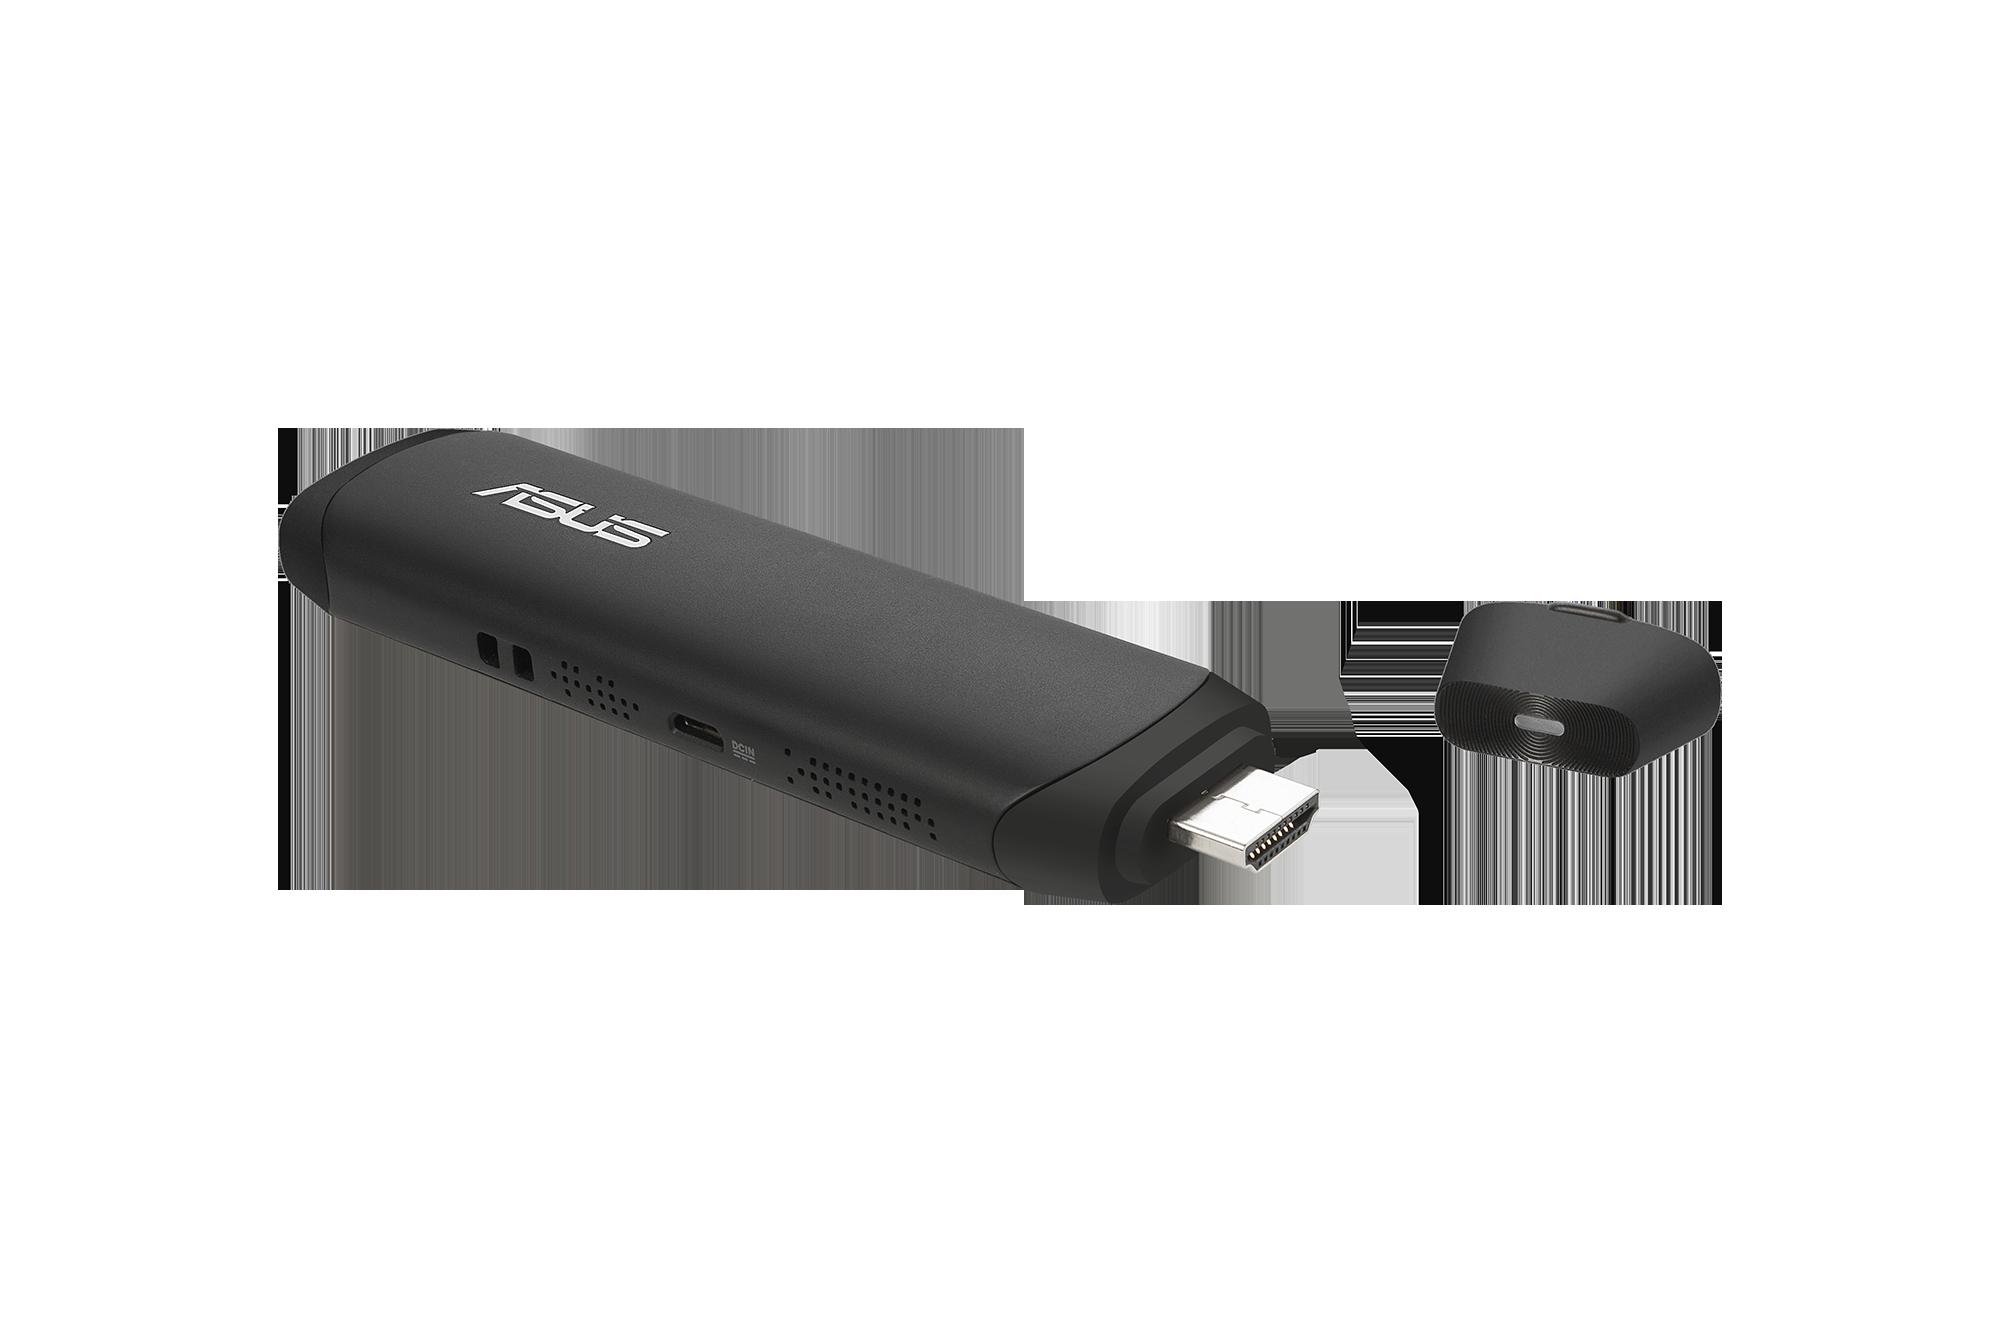 Asus VivoStick PC TS10 Z8350/32GB/2GB/win10